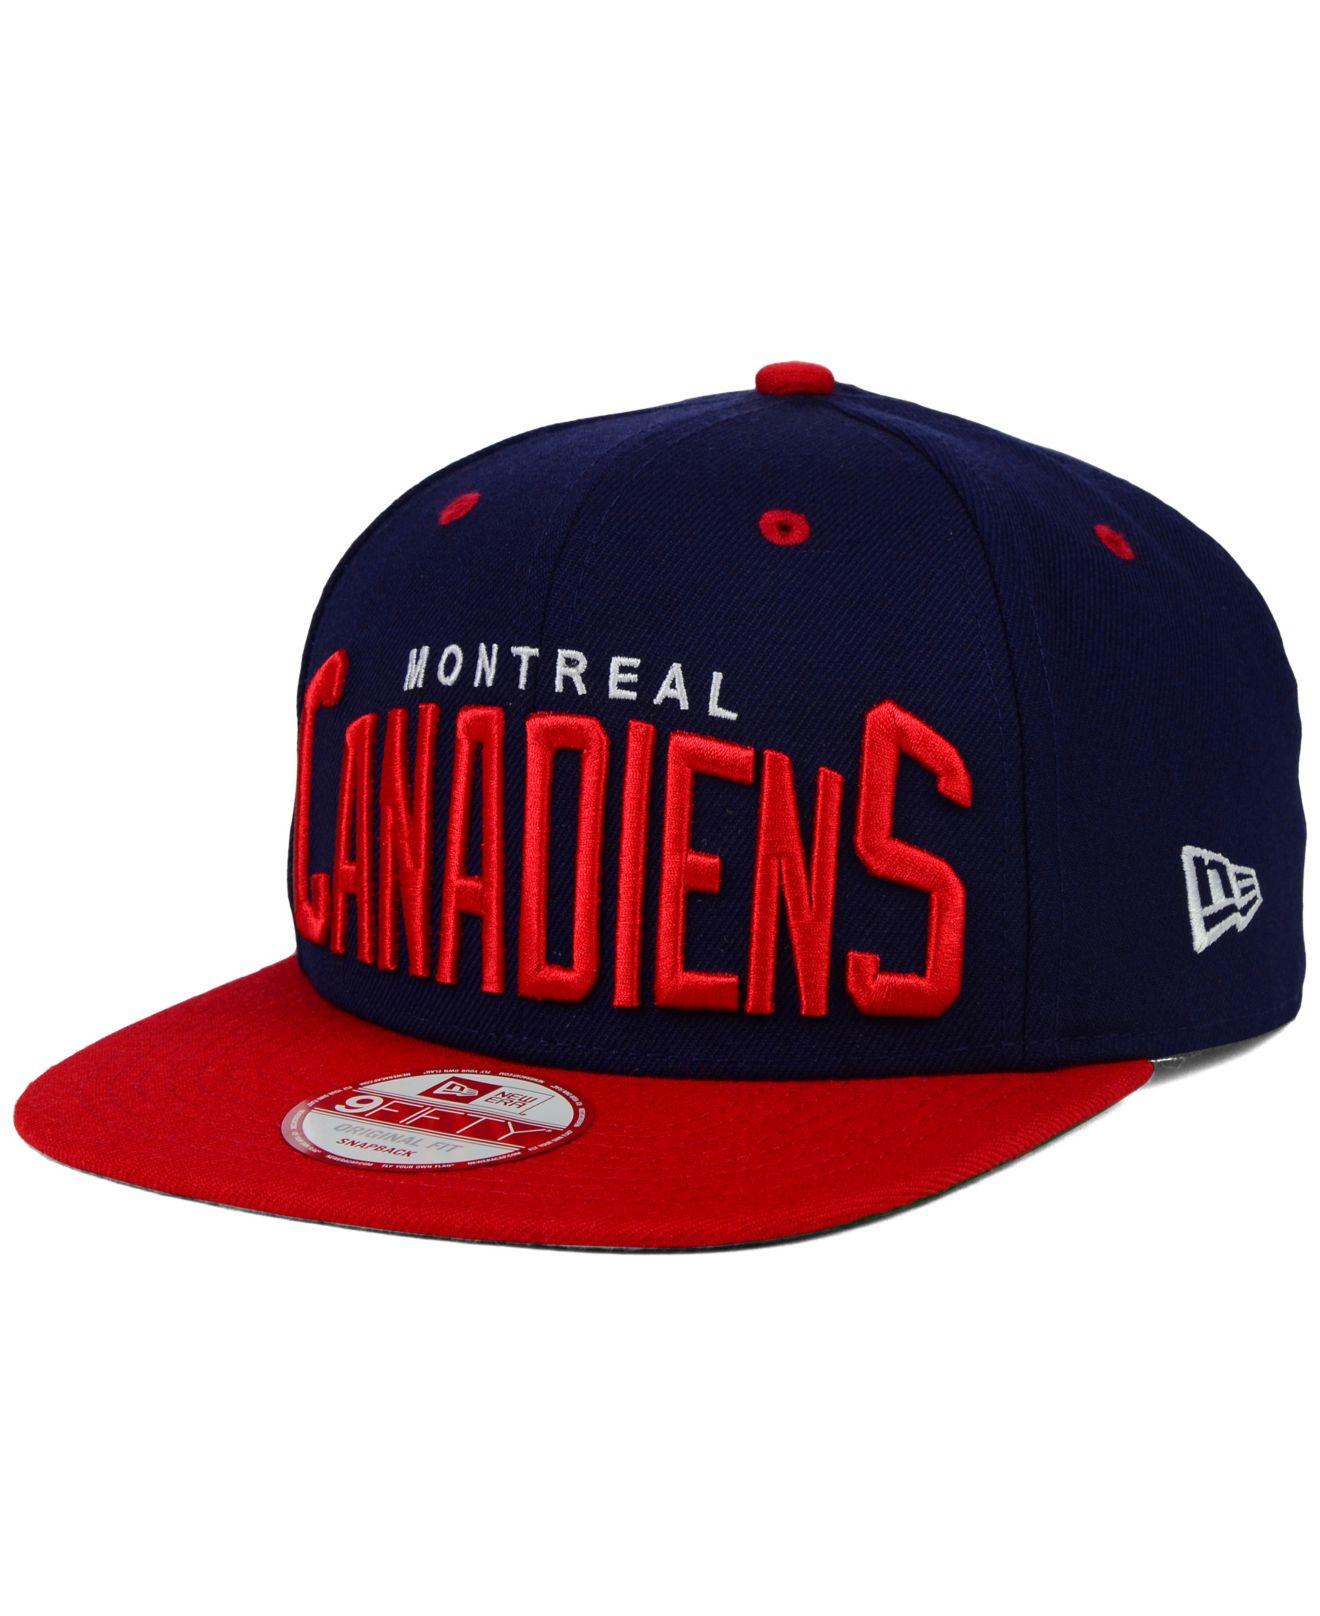 Lyst - KTZ Montreal Canadiens Vintage Big Word 9fifty Snapback Cap ... 6afe3c675977